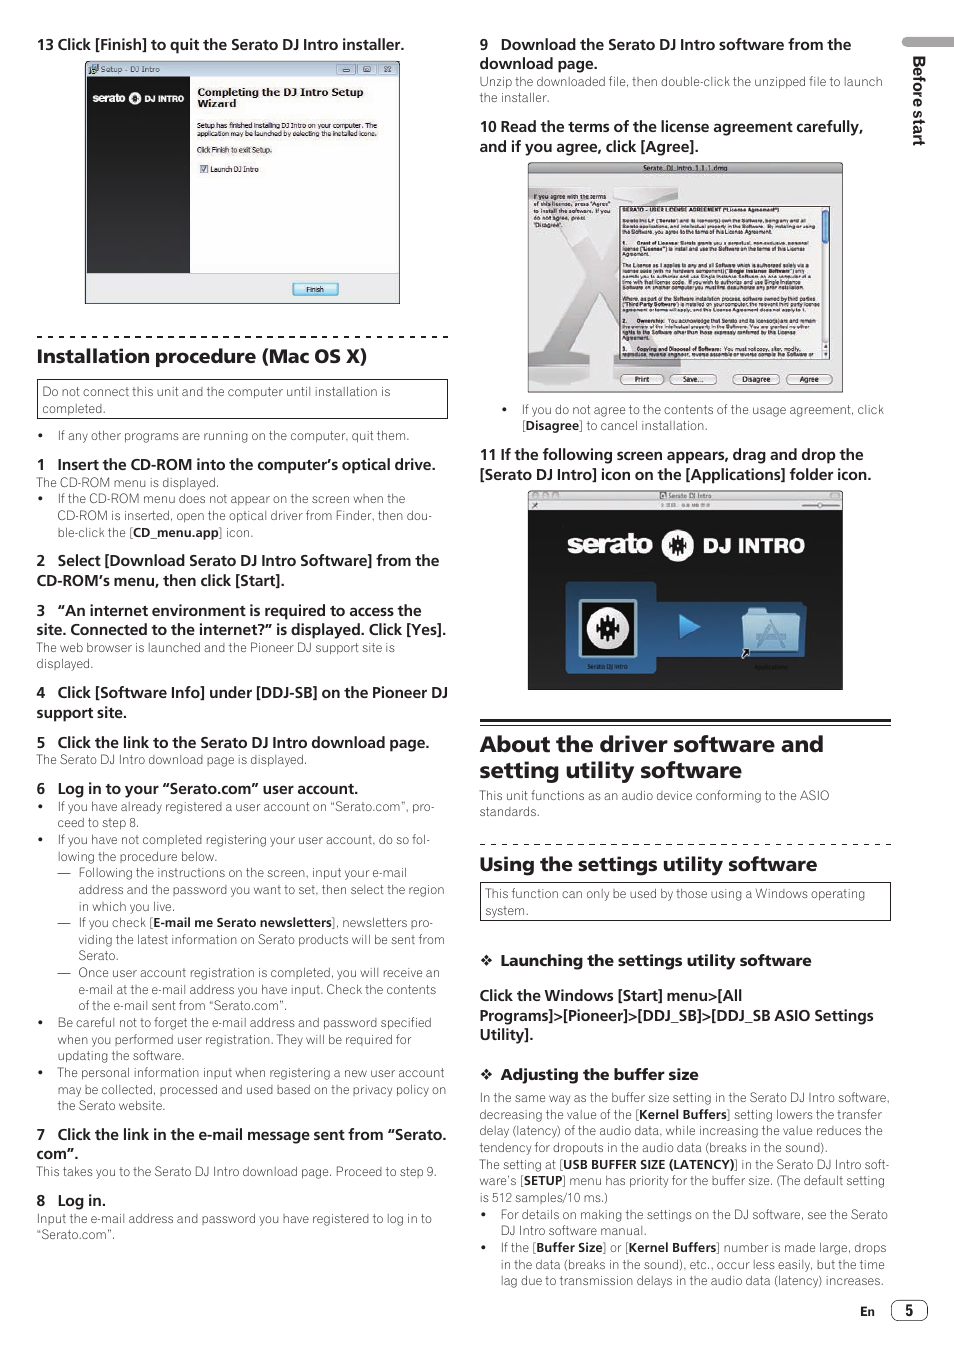 Installation procedure (mac os x), Using the settings